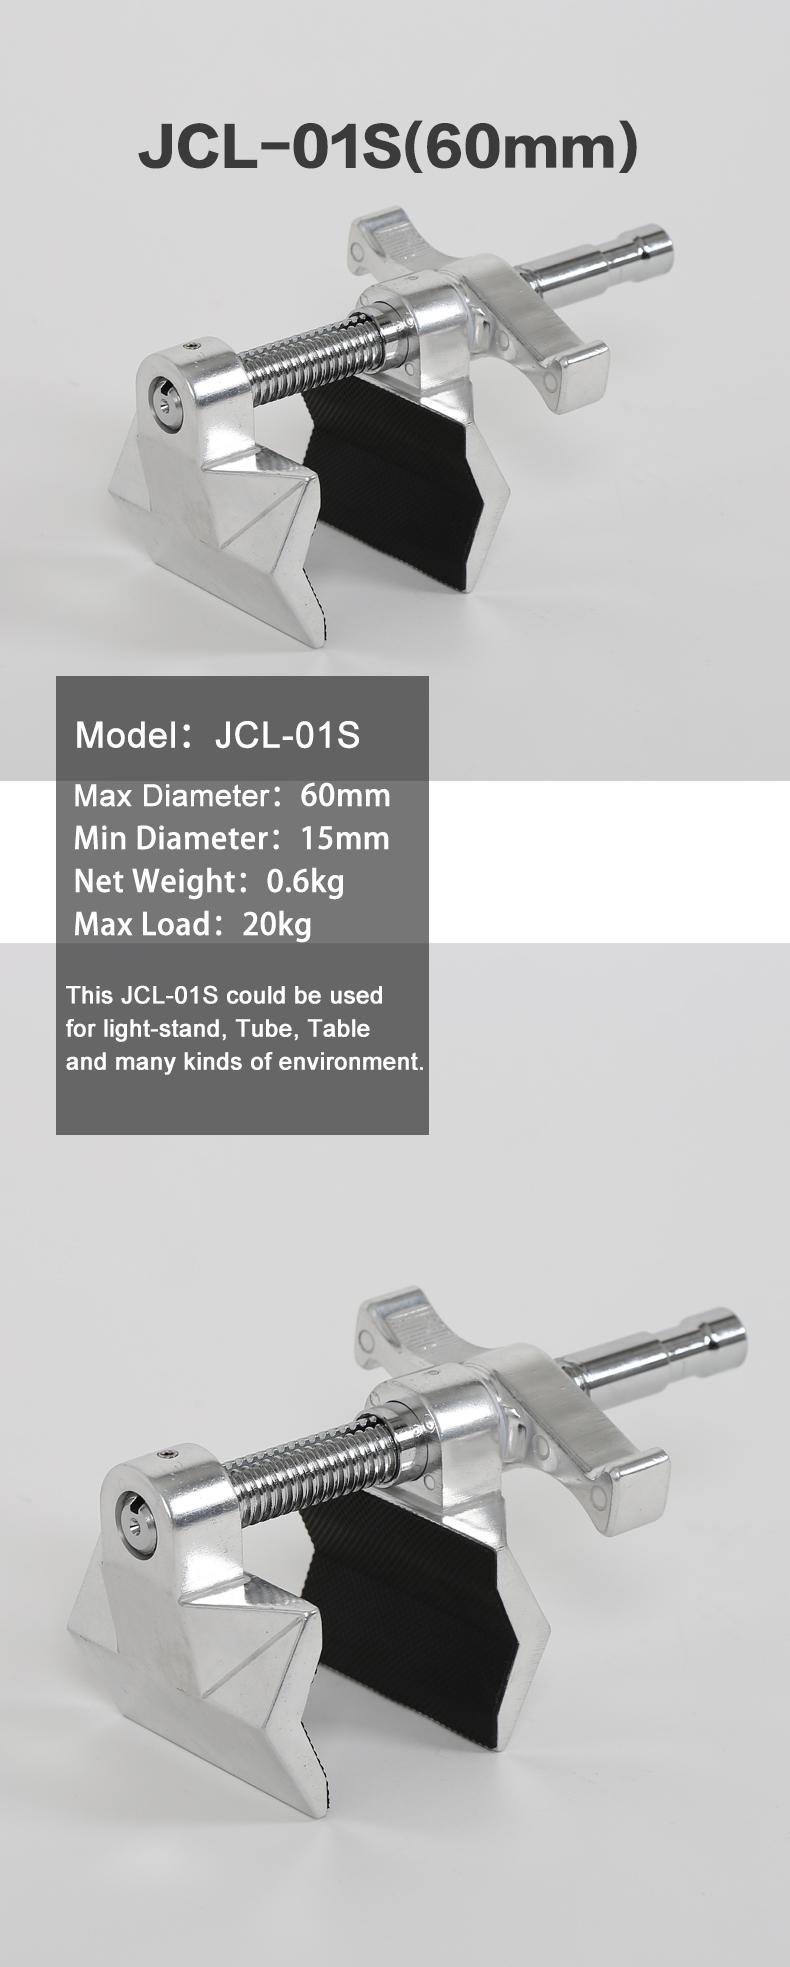 2018 Hot sale 15-60mm JCL-01S Heavy Metal C Type Clamp U Clip Bracket for Photo Studio Light Stand Camera Flash Accessories 8